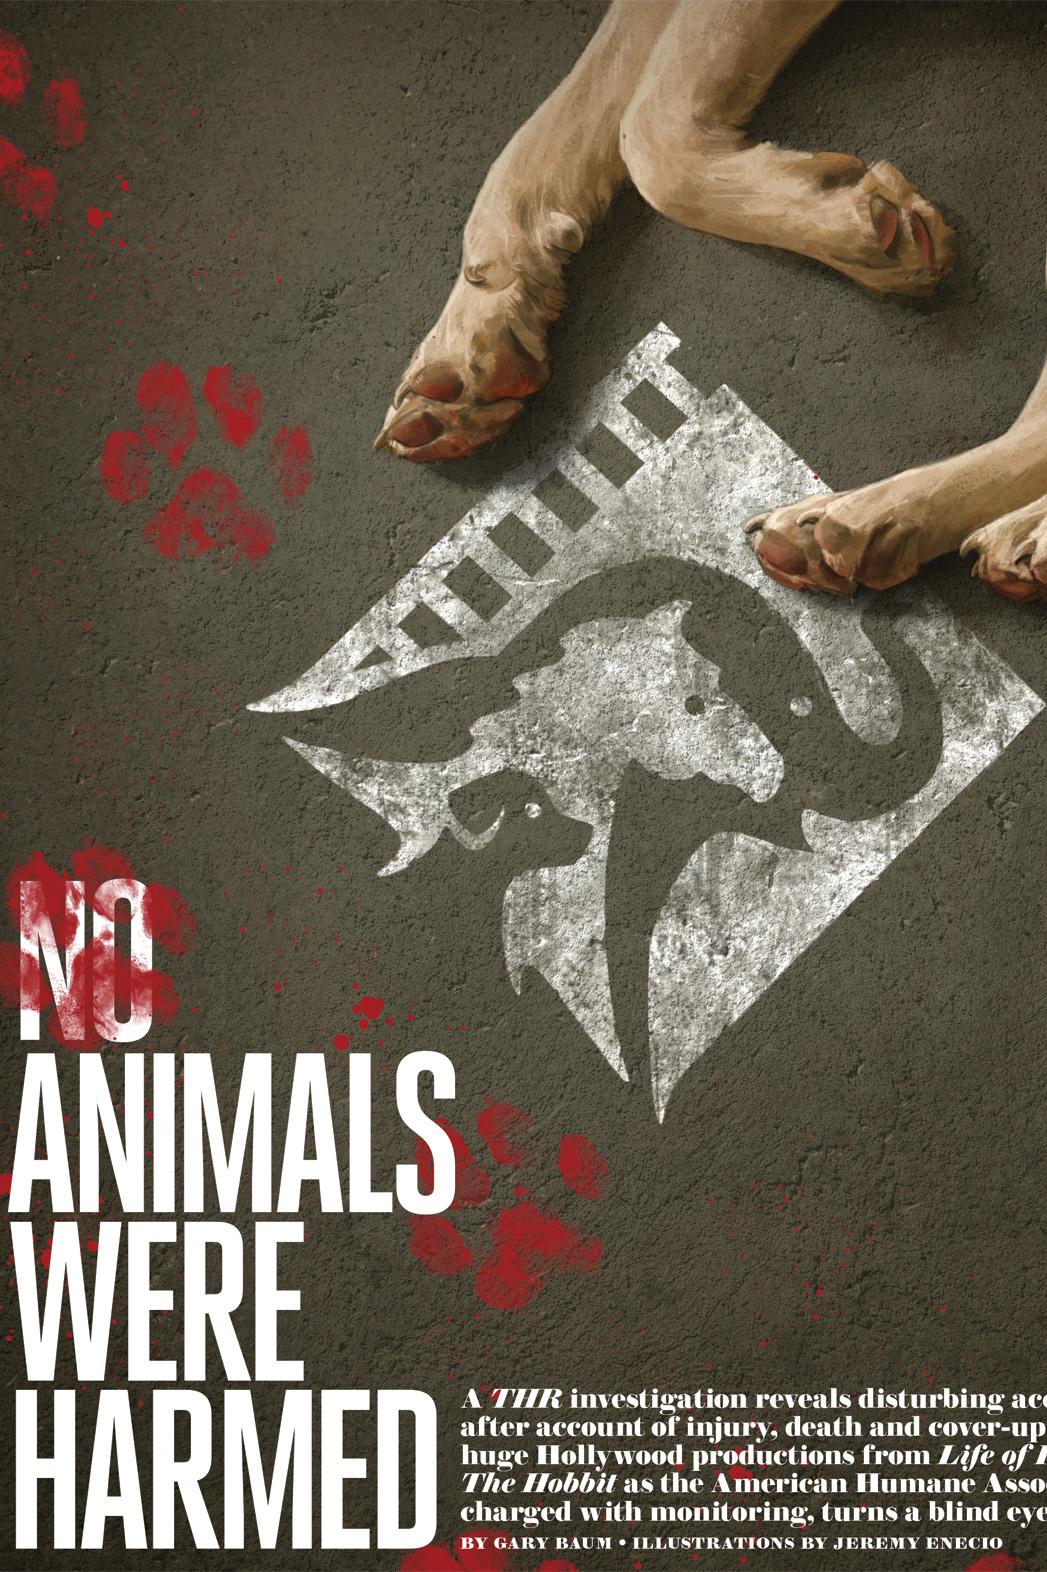 Issue 1 REP No Animals Were Harmed Opener Crop - P 2013